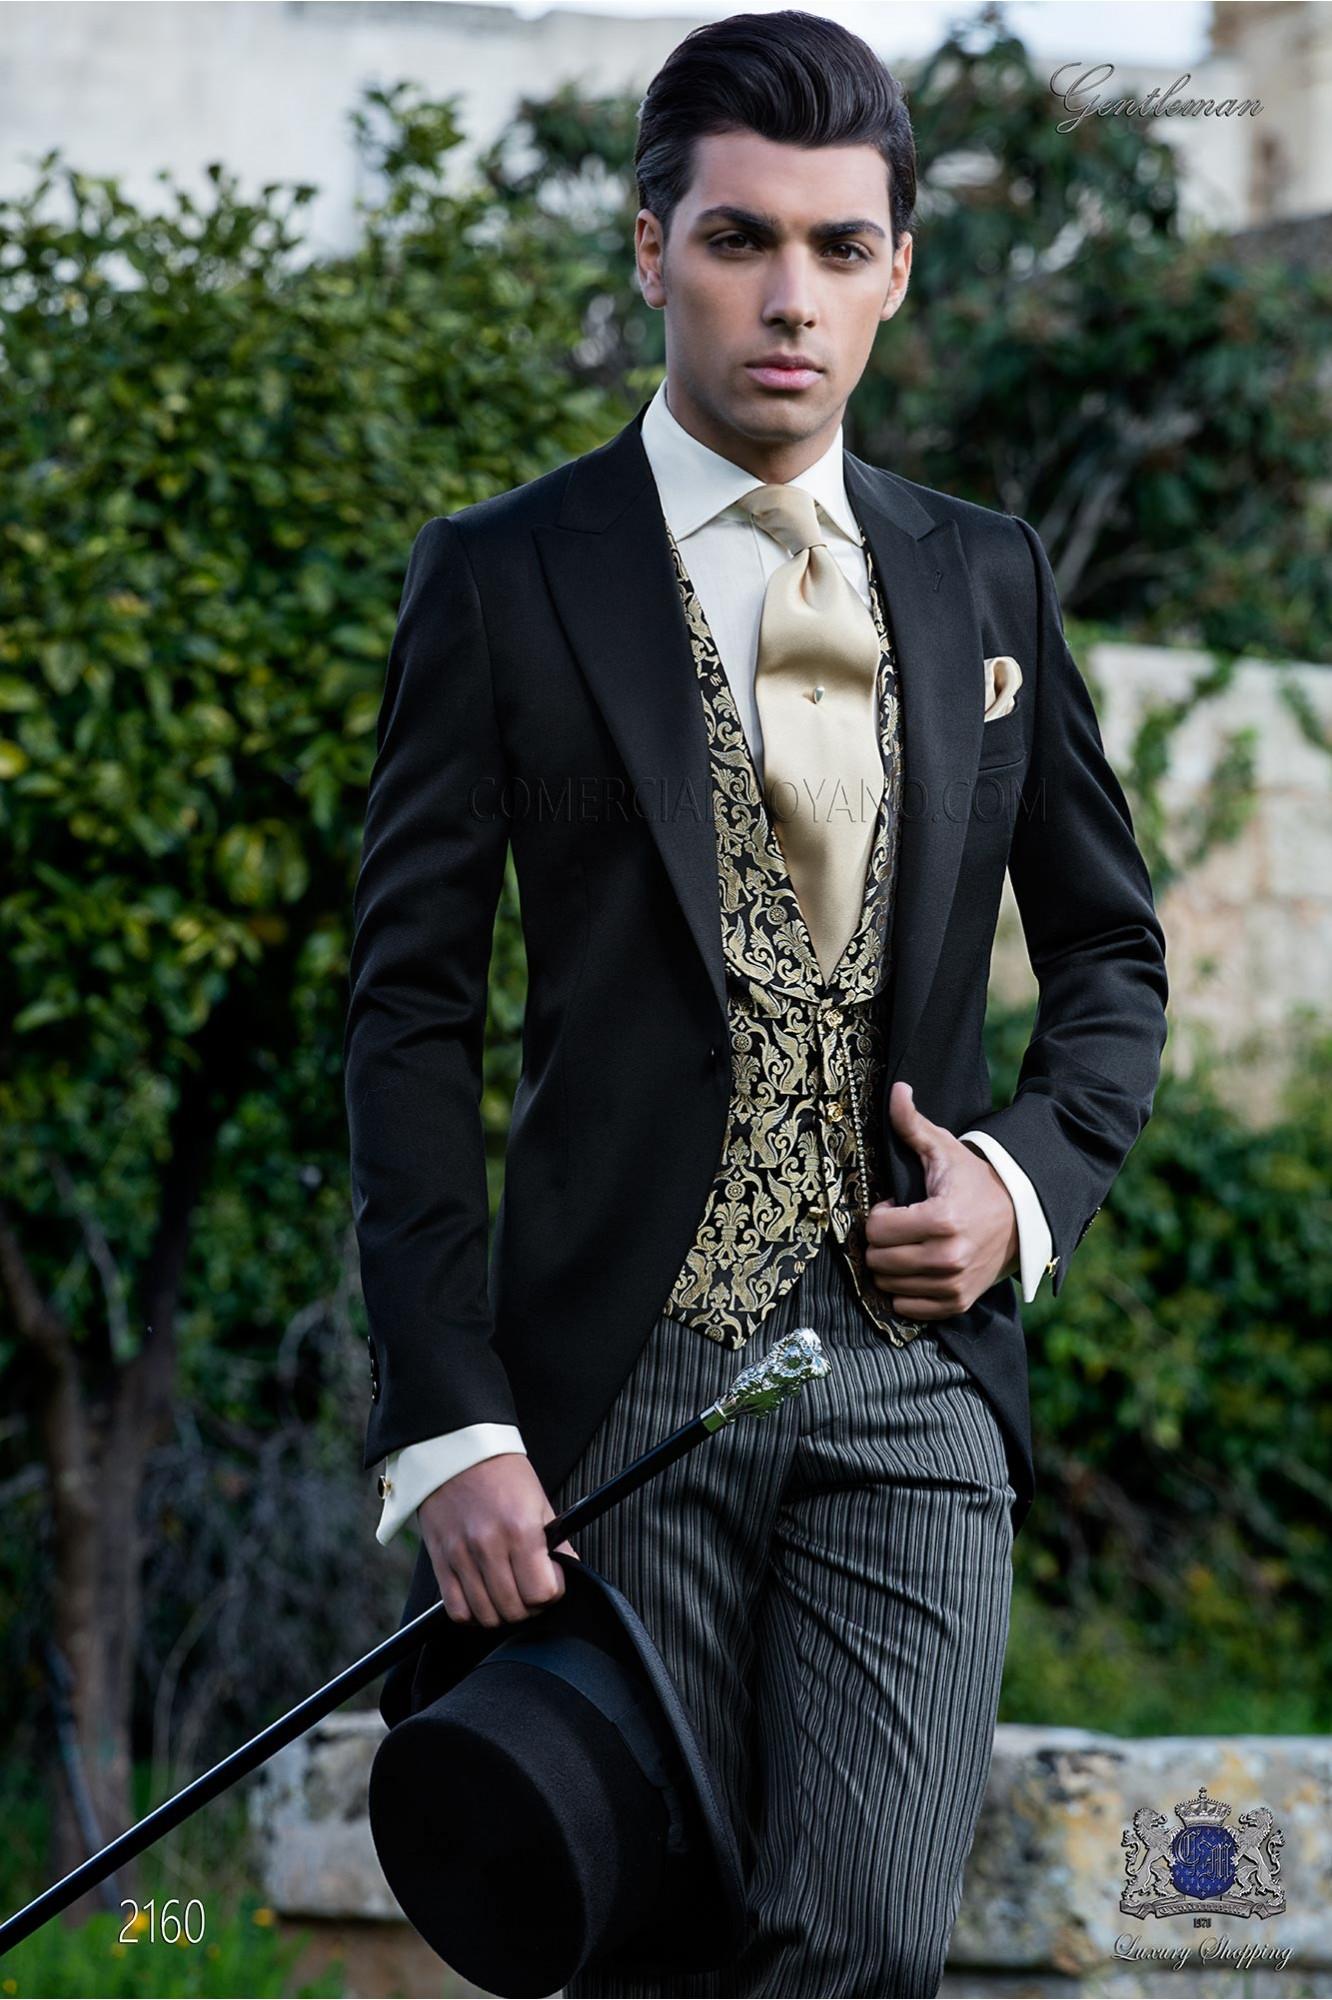 Italian bespoke black morning suit